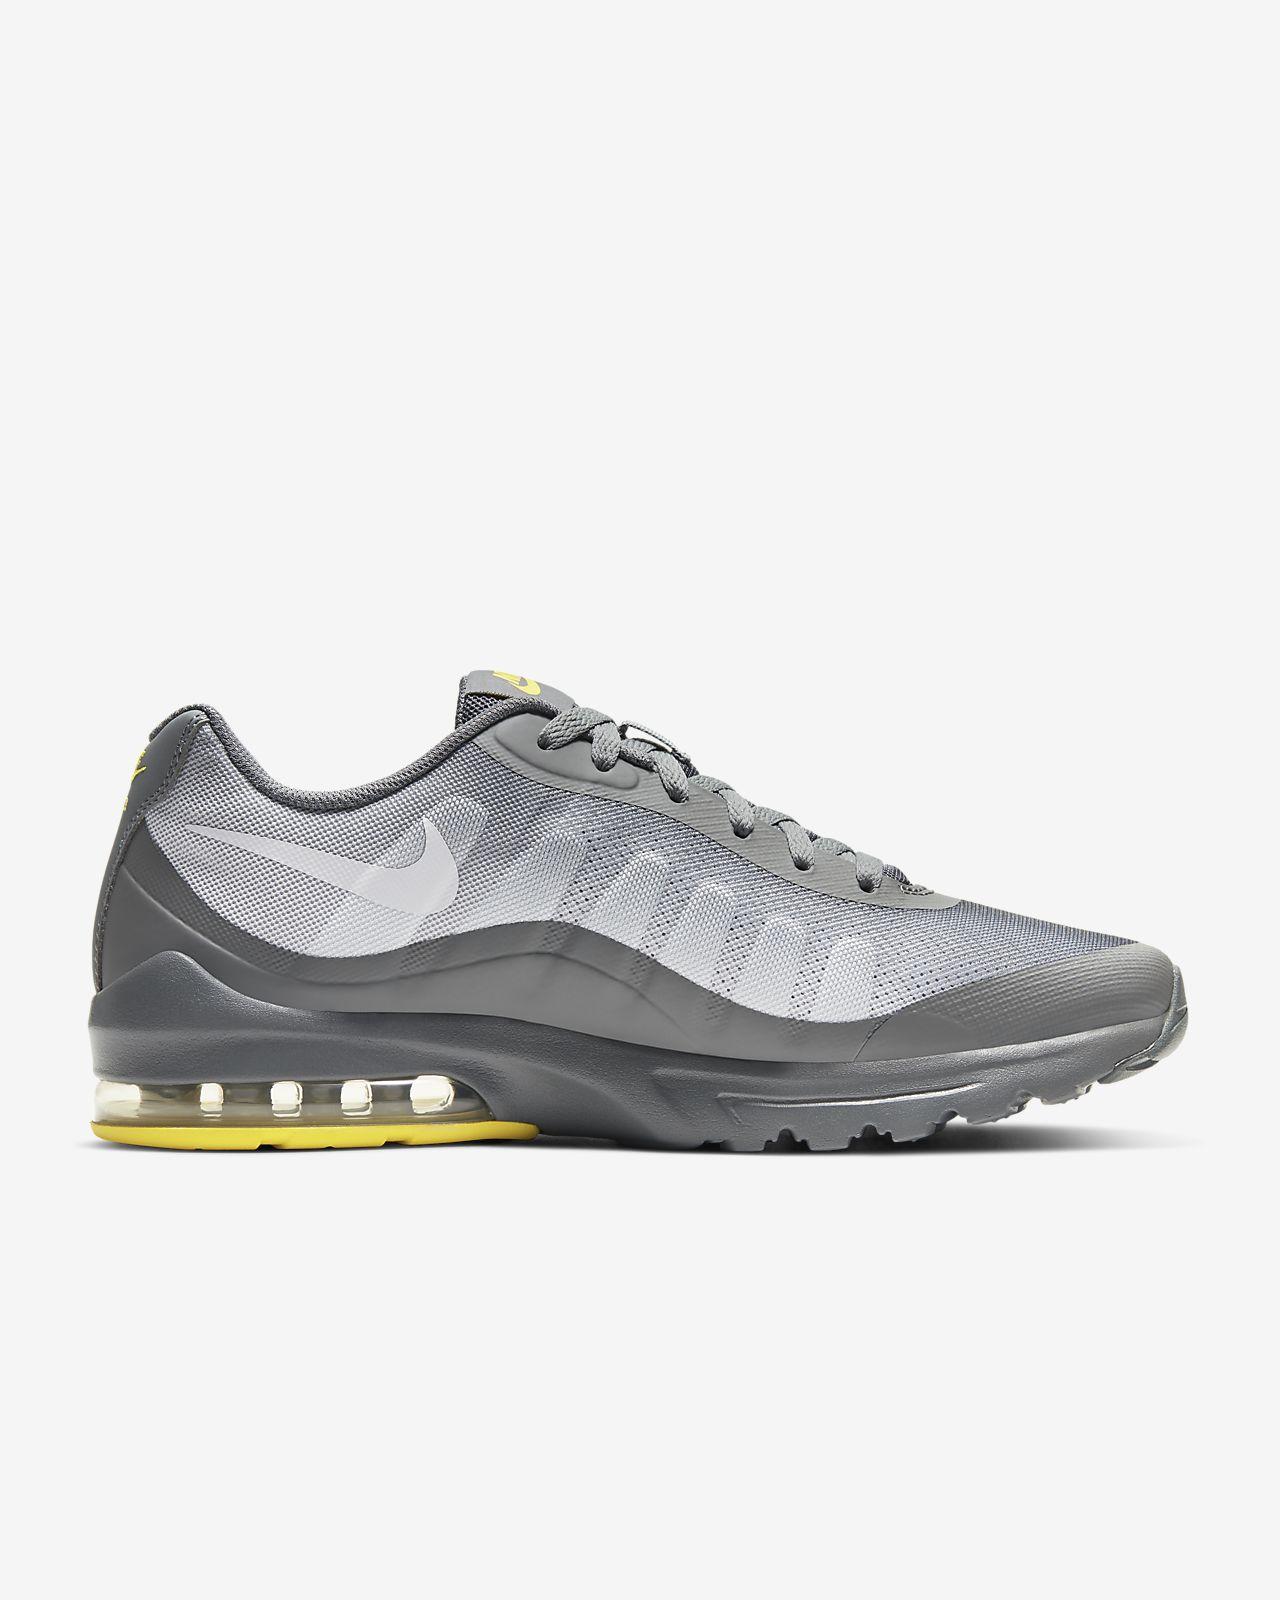 Buty męskie Nike Air Max Invigor